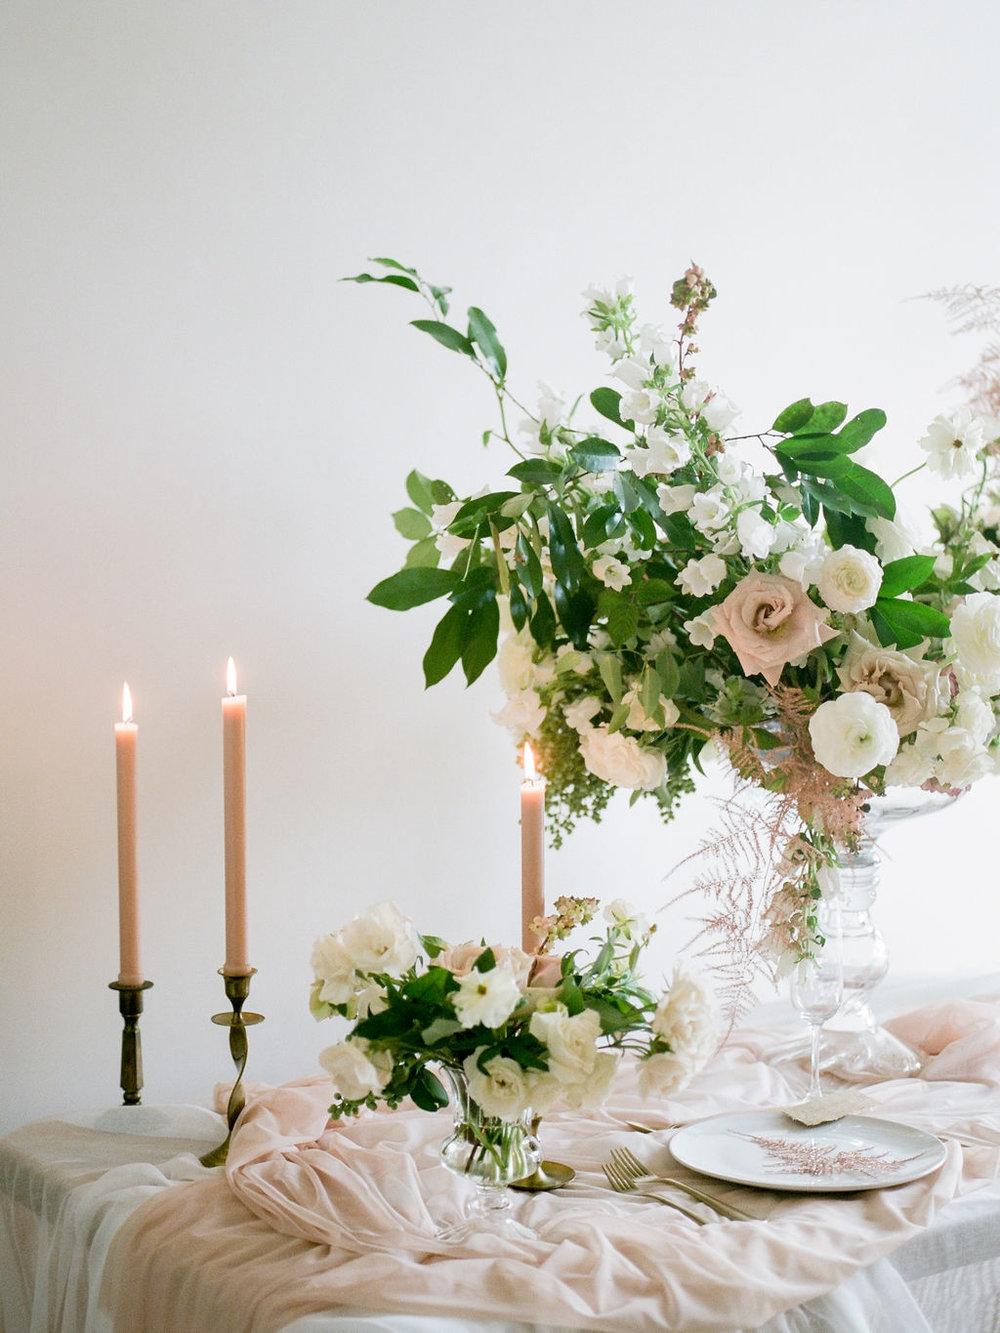 Maxit-Flower-Design-Christine-Gosch-Blush-Taper-Candles-Houston-Wedding-Events-Flowers-Florist.jpg